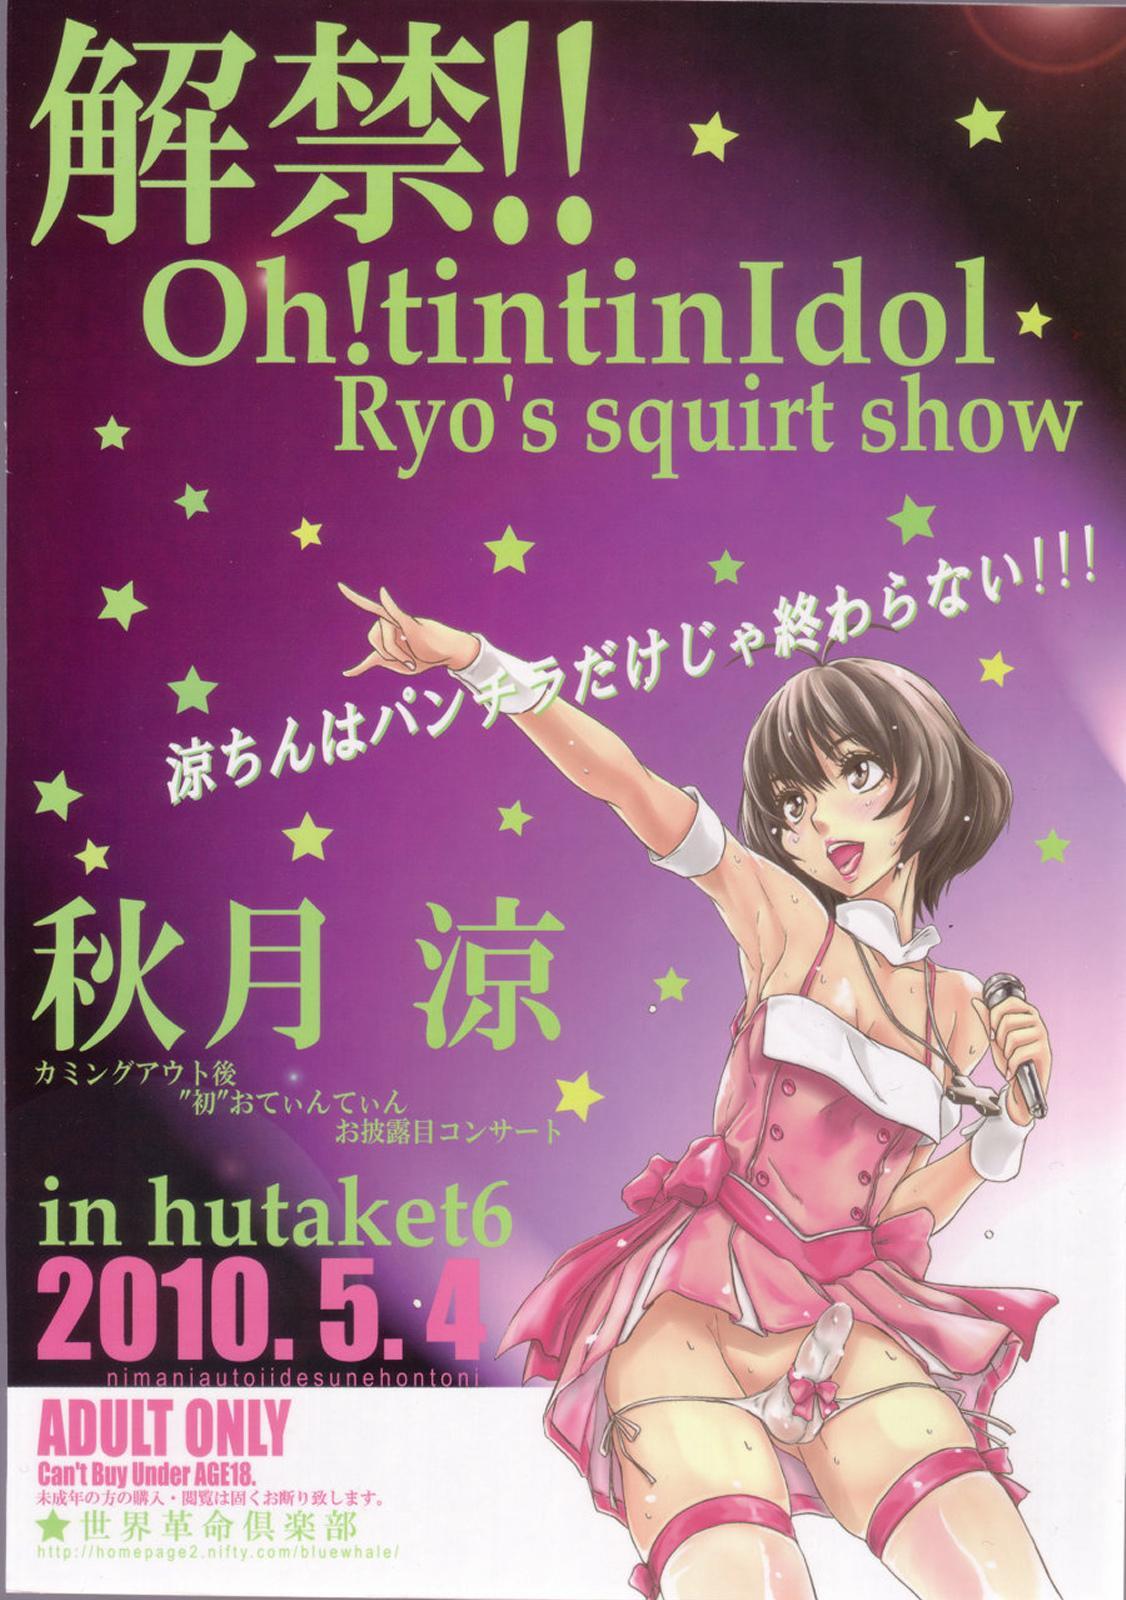 Kaikin!! Oh! tin tin Idol - Ryo's squirt show 37